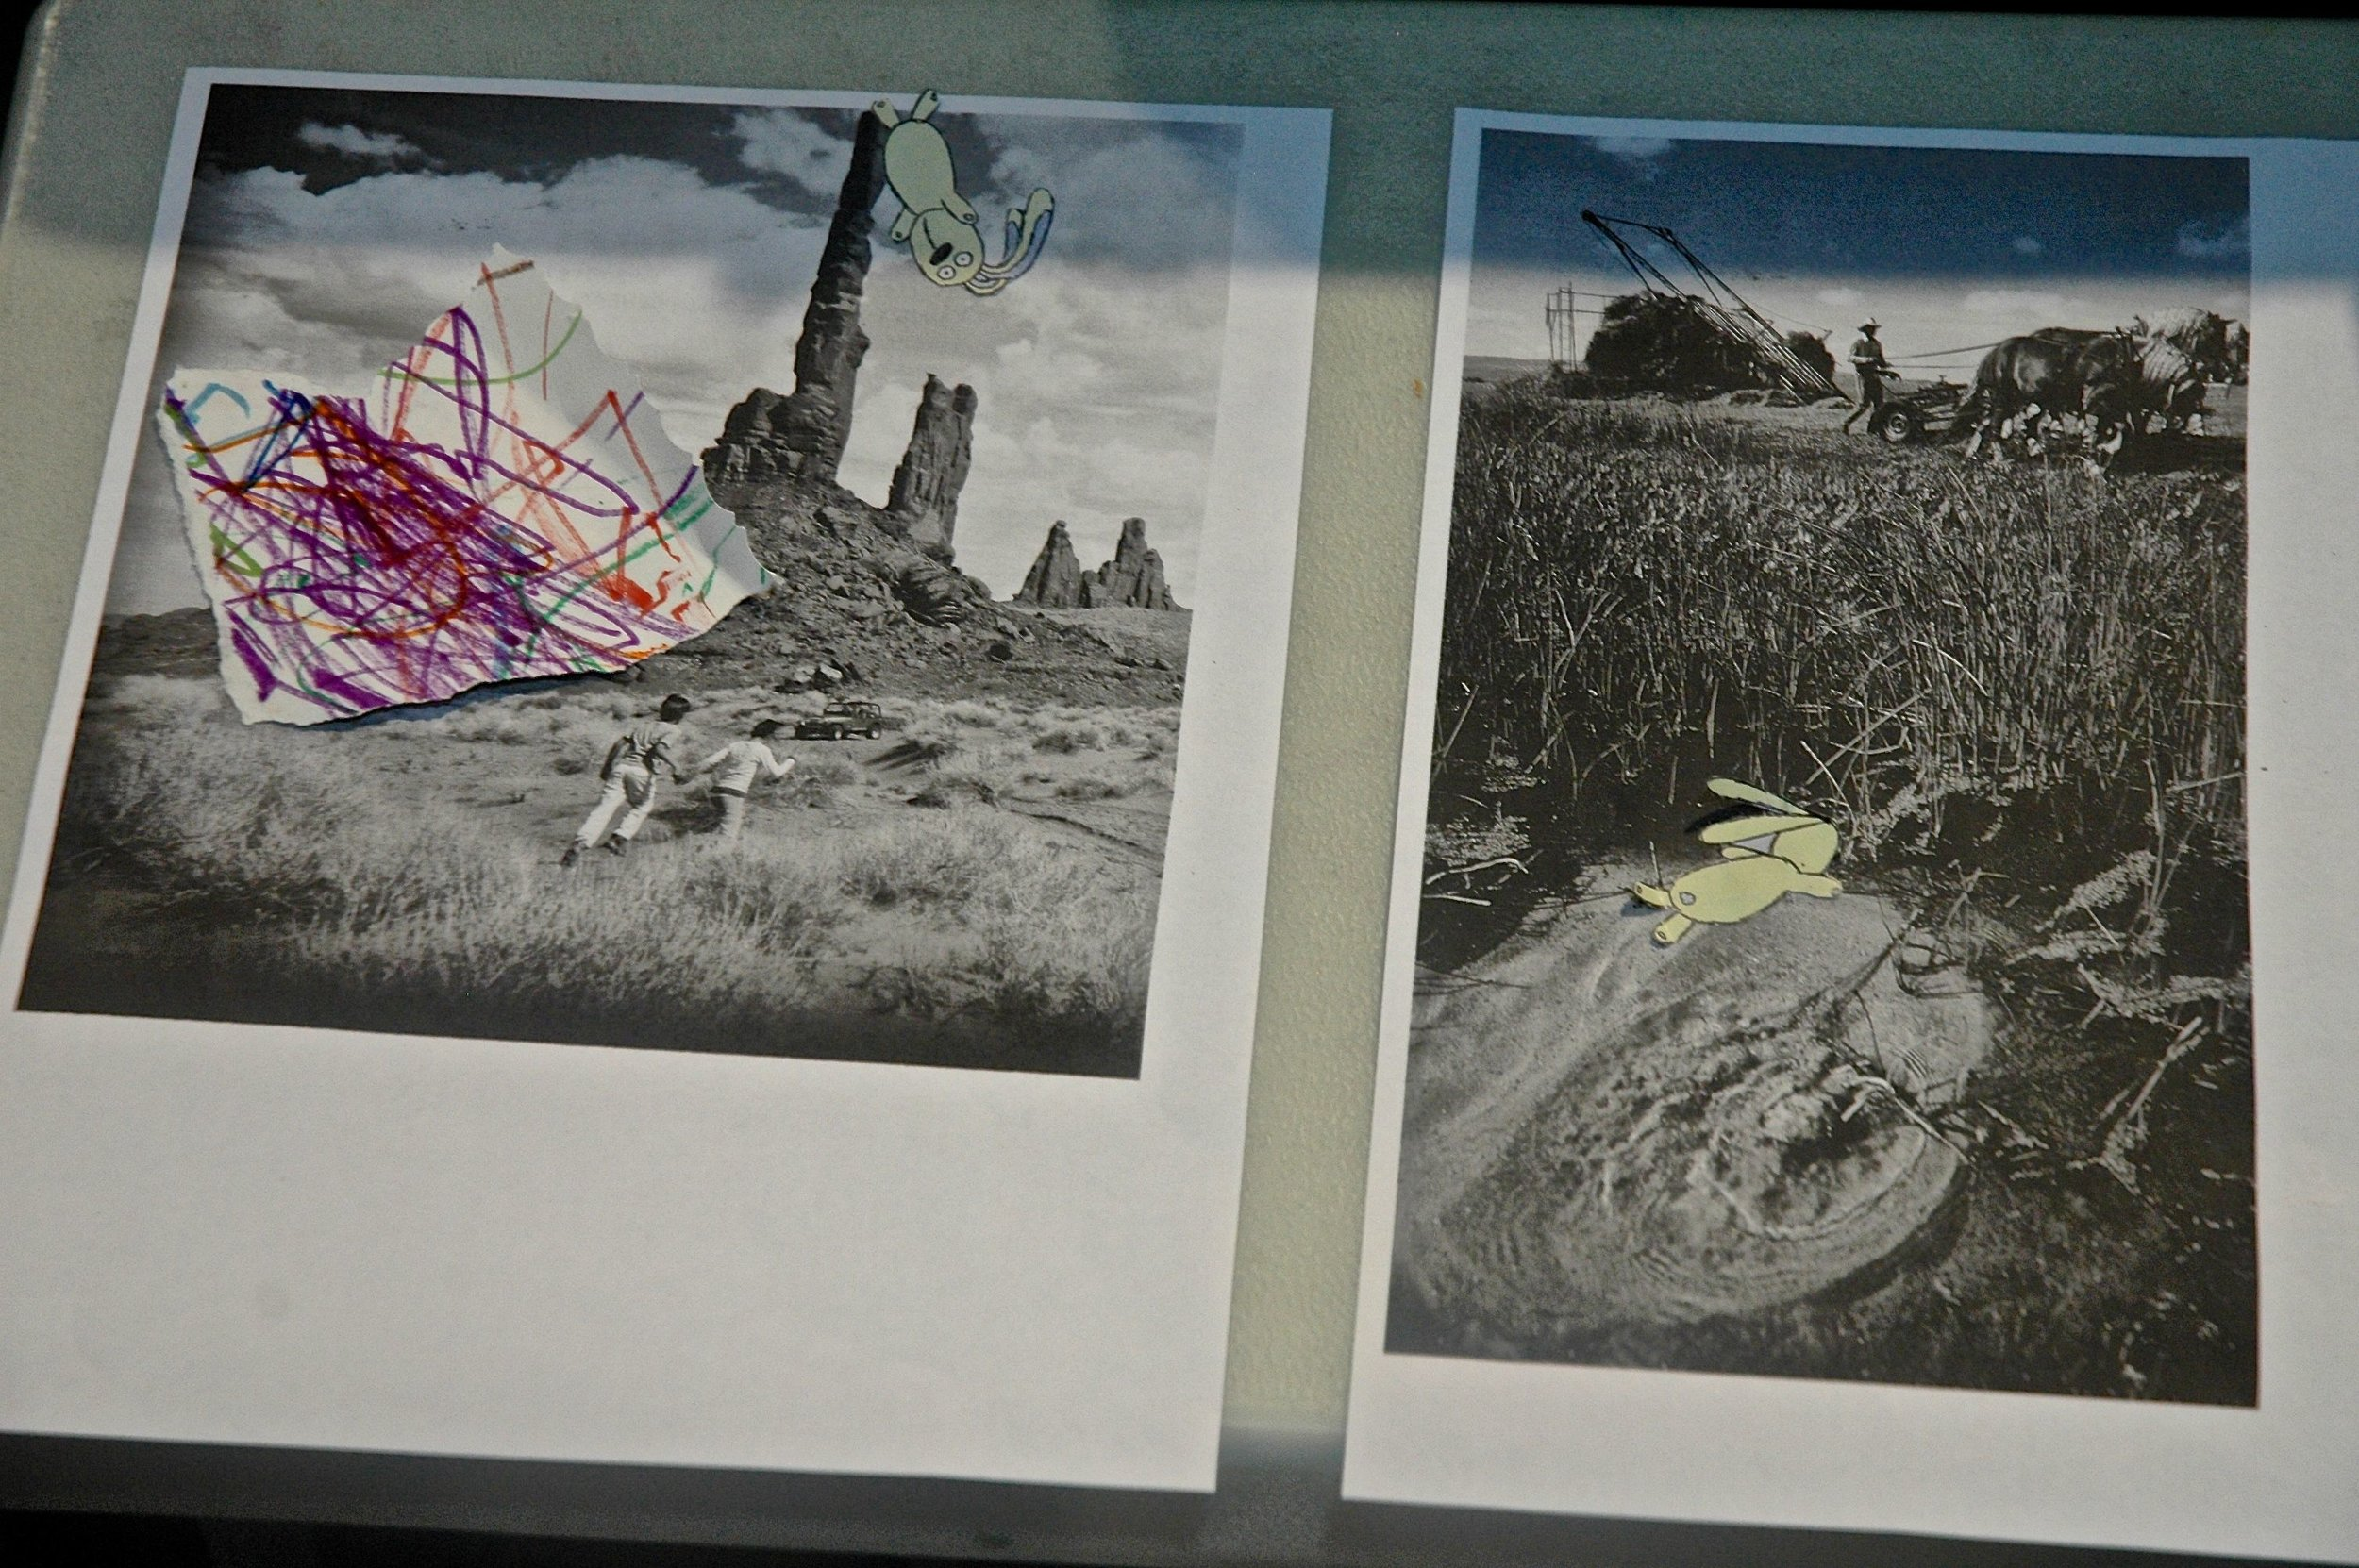 photo-story-boards.jpg